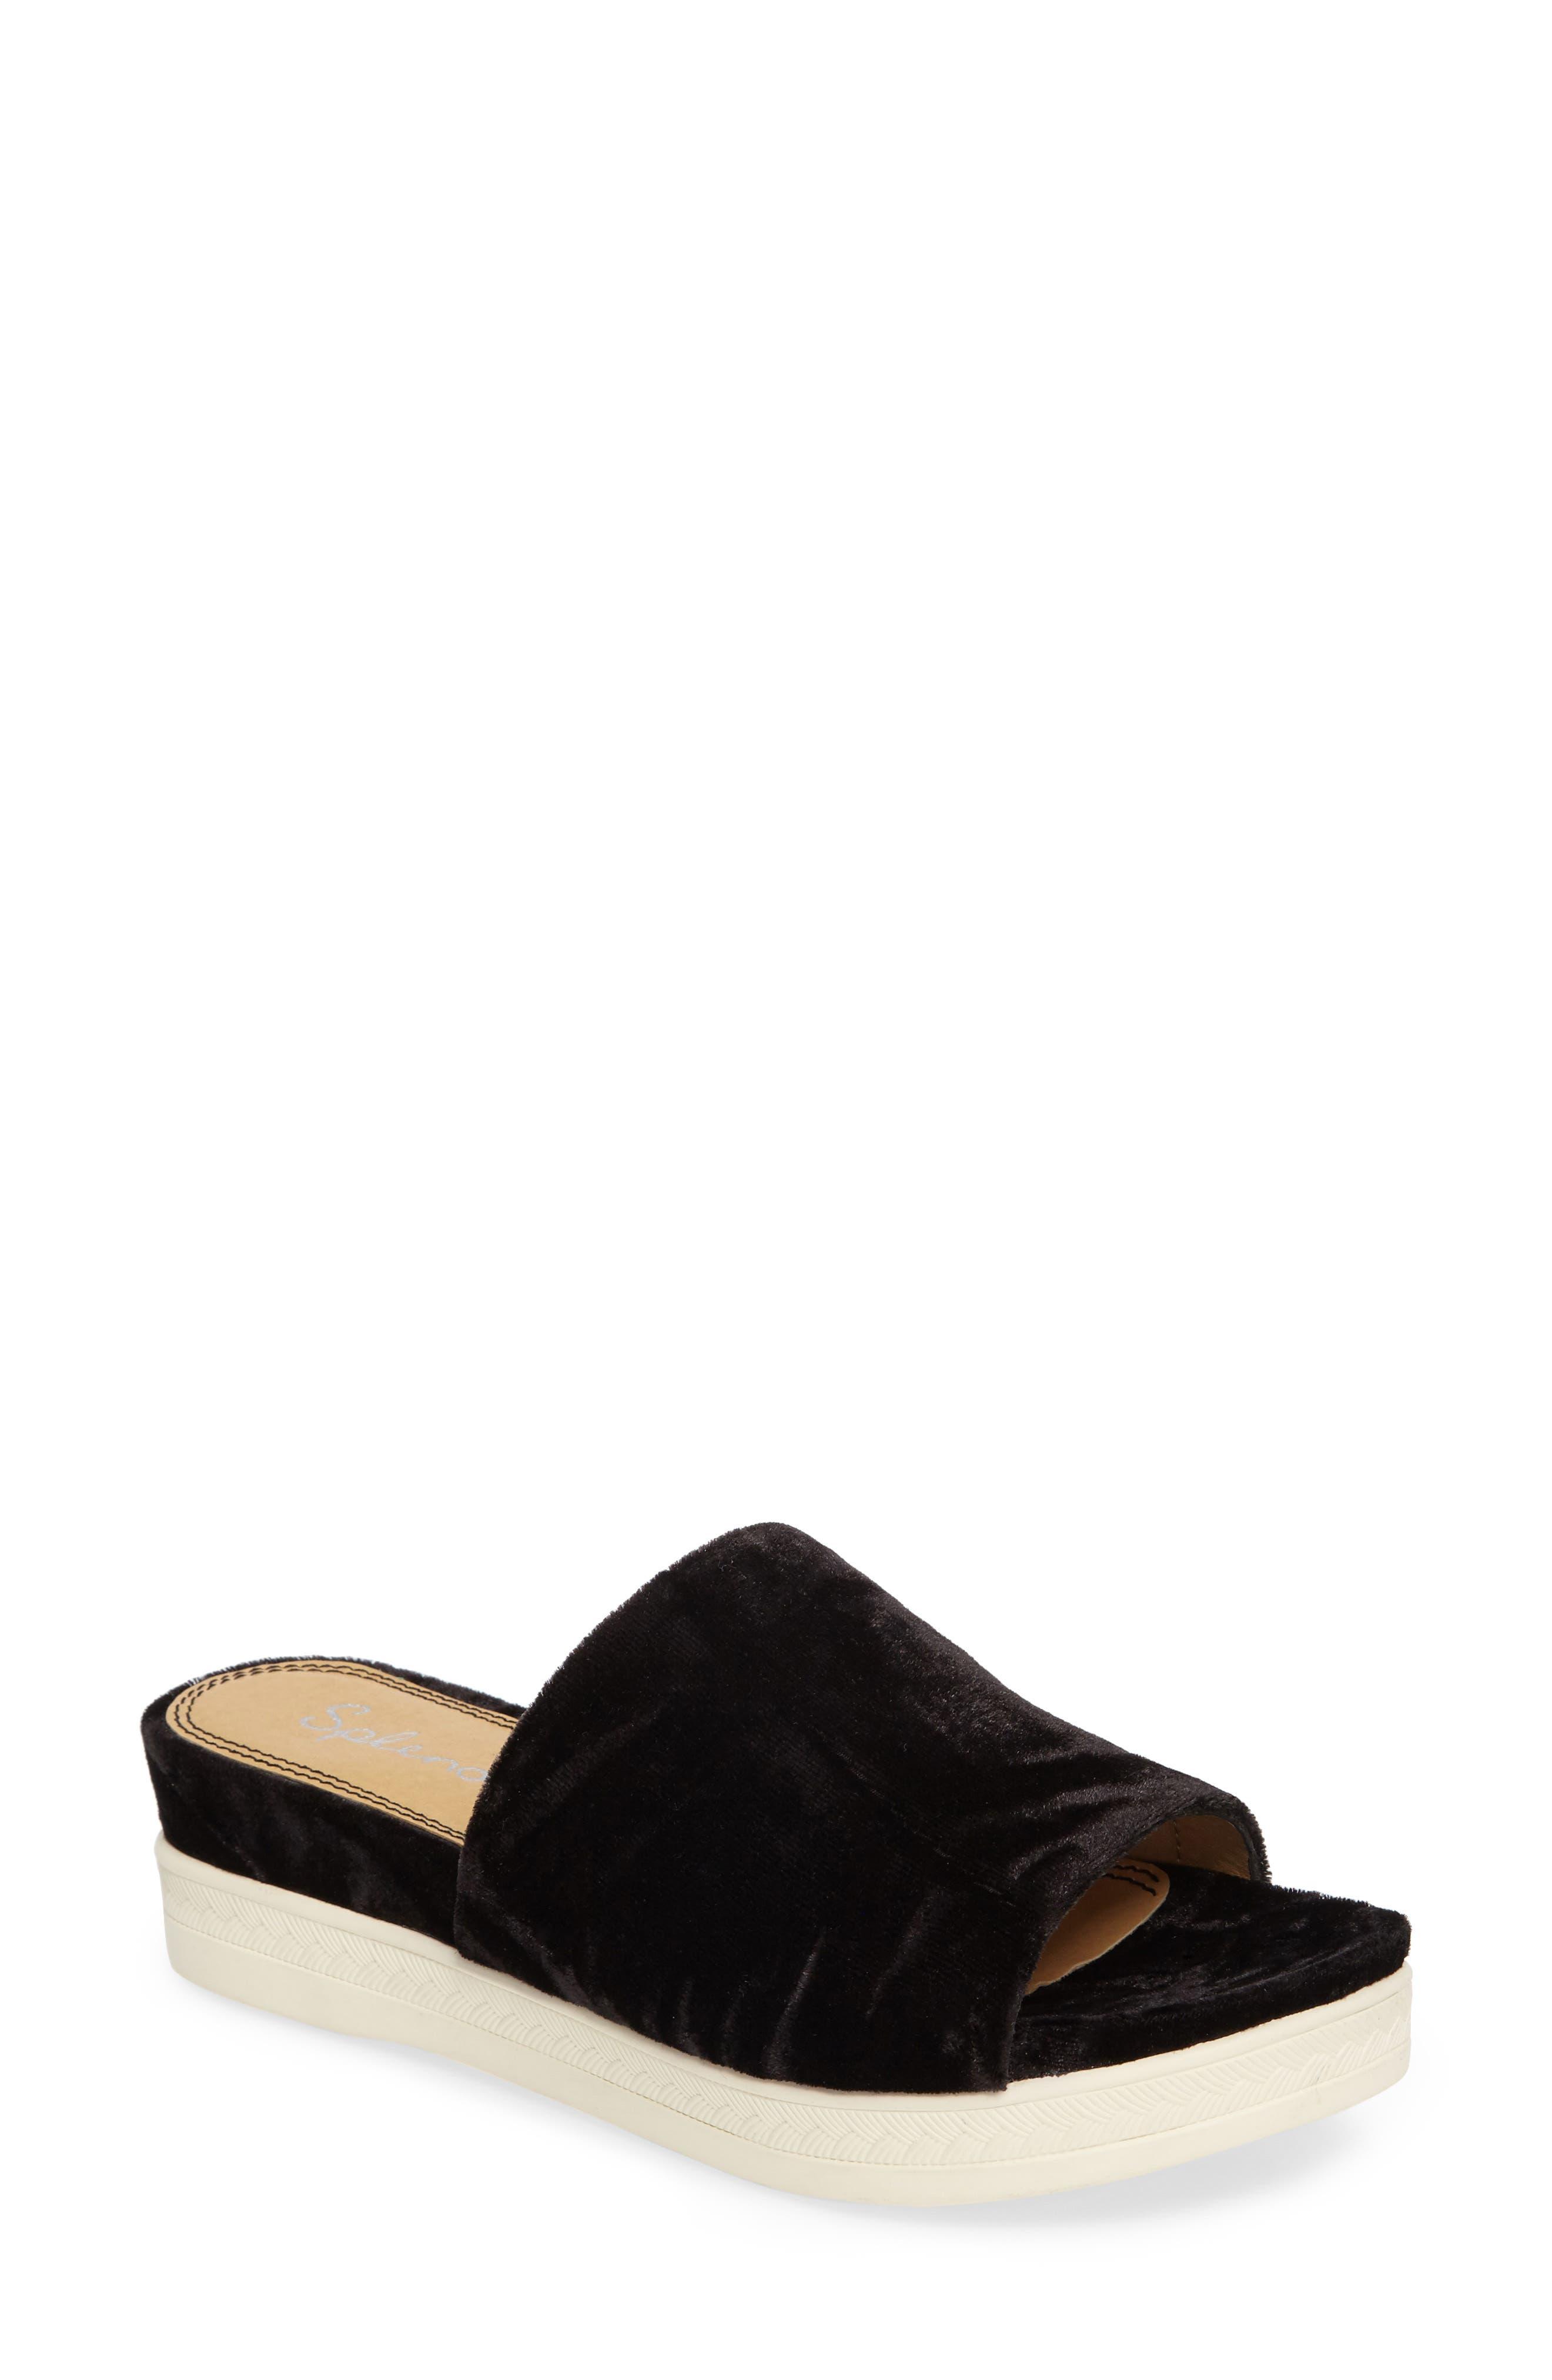 Darla Slide Sandal,                         Main,                         color, 006